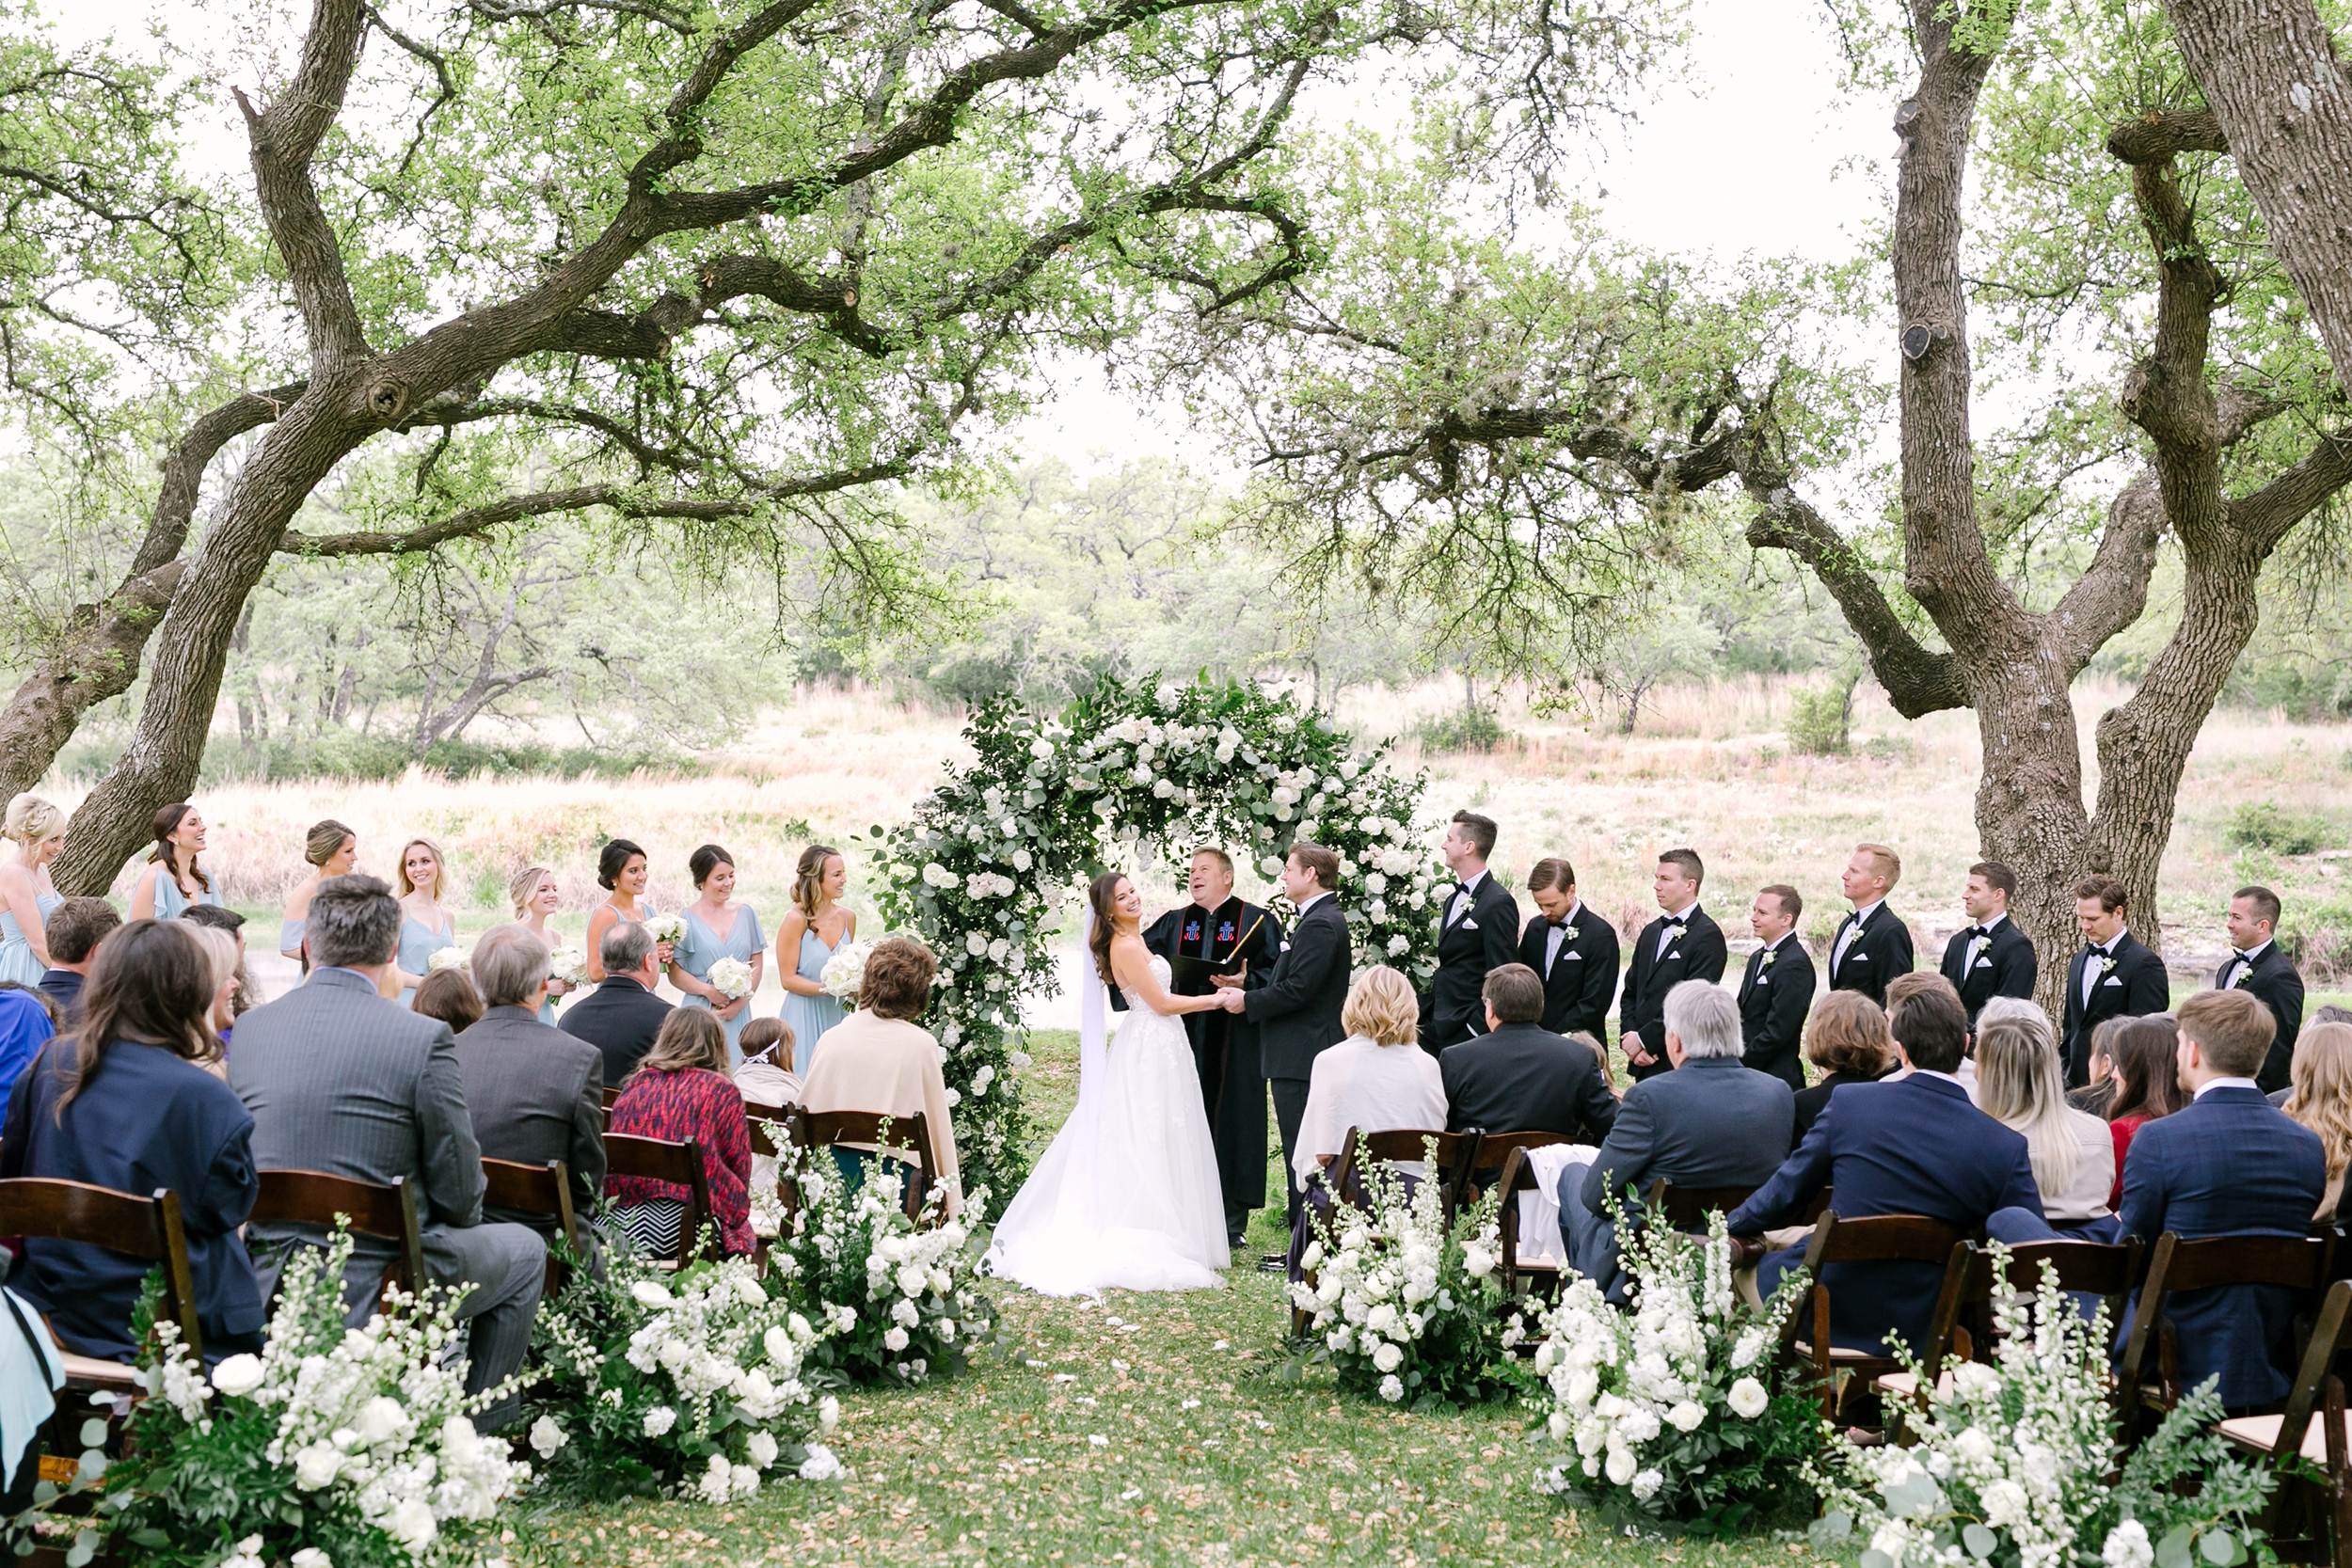 Austin_Wedding_Photographer_Kimberly_Brooke_Photographic_067.jpg